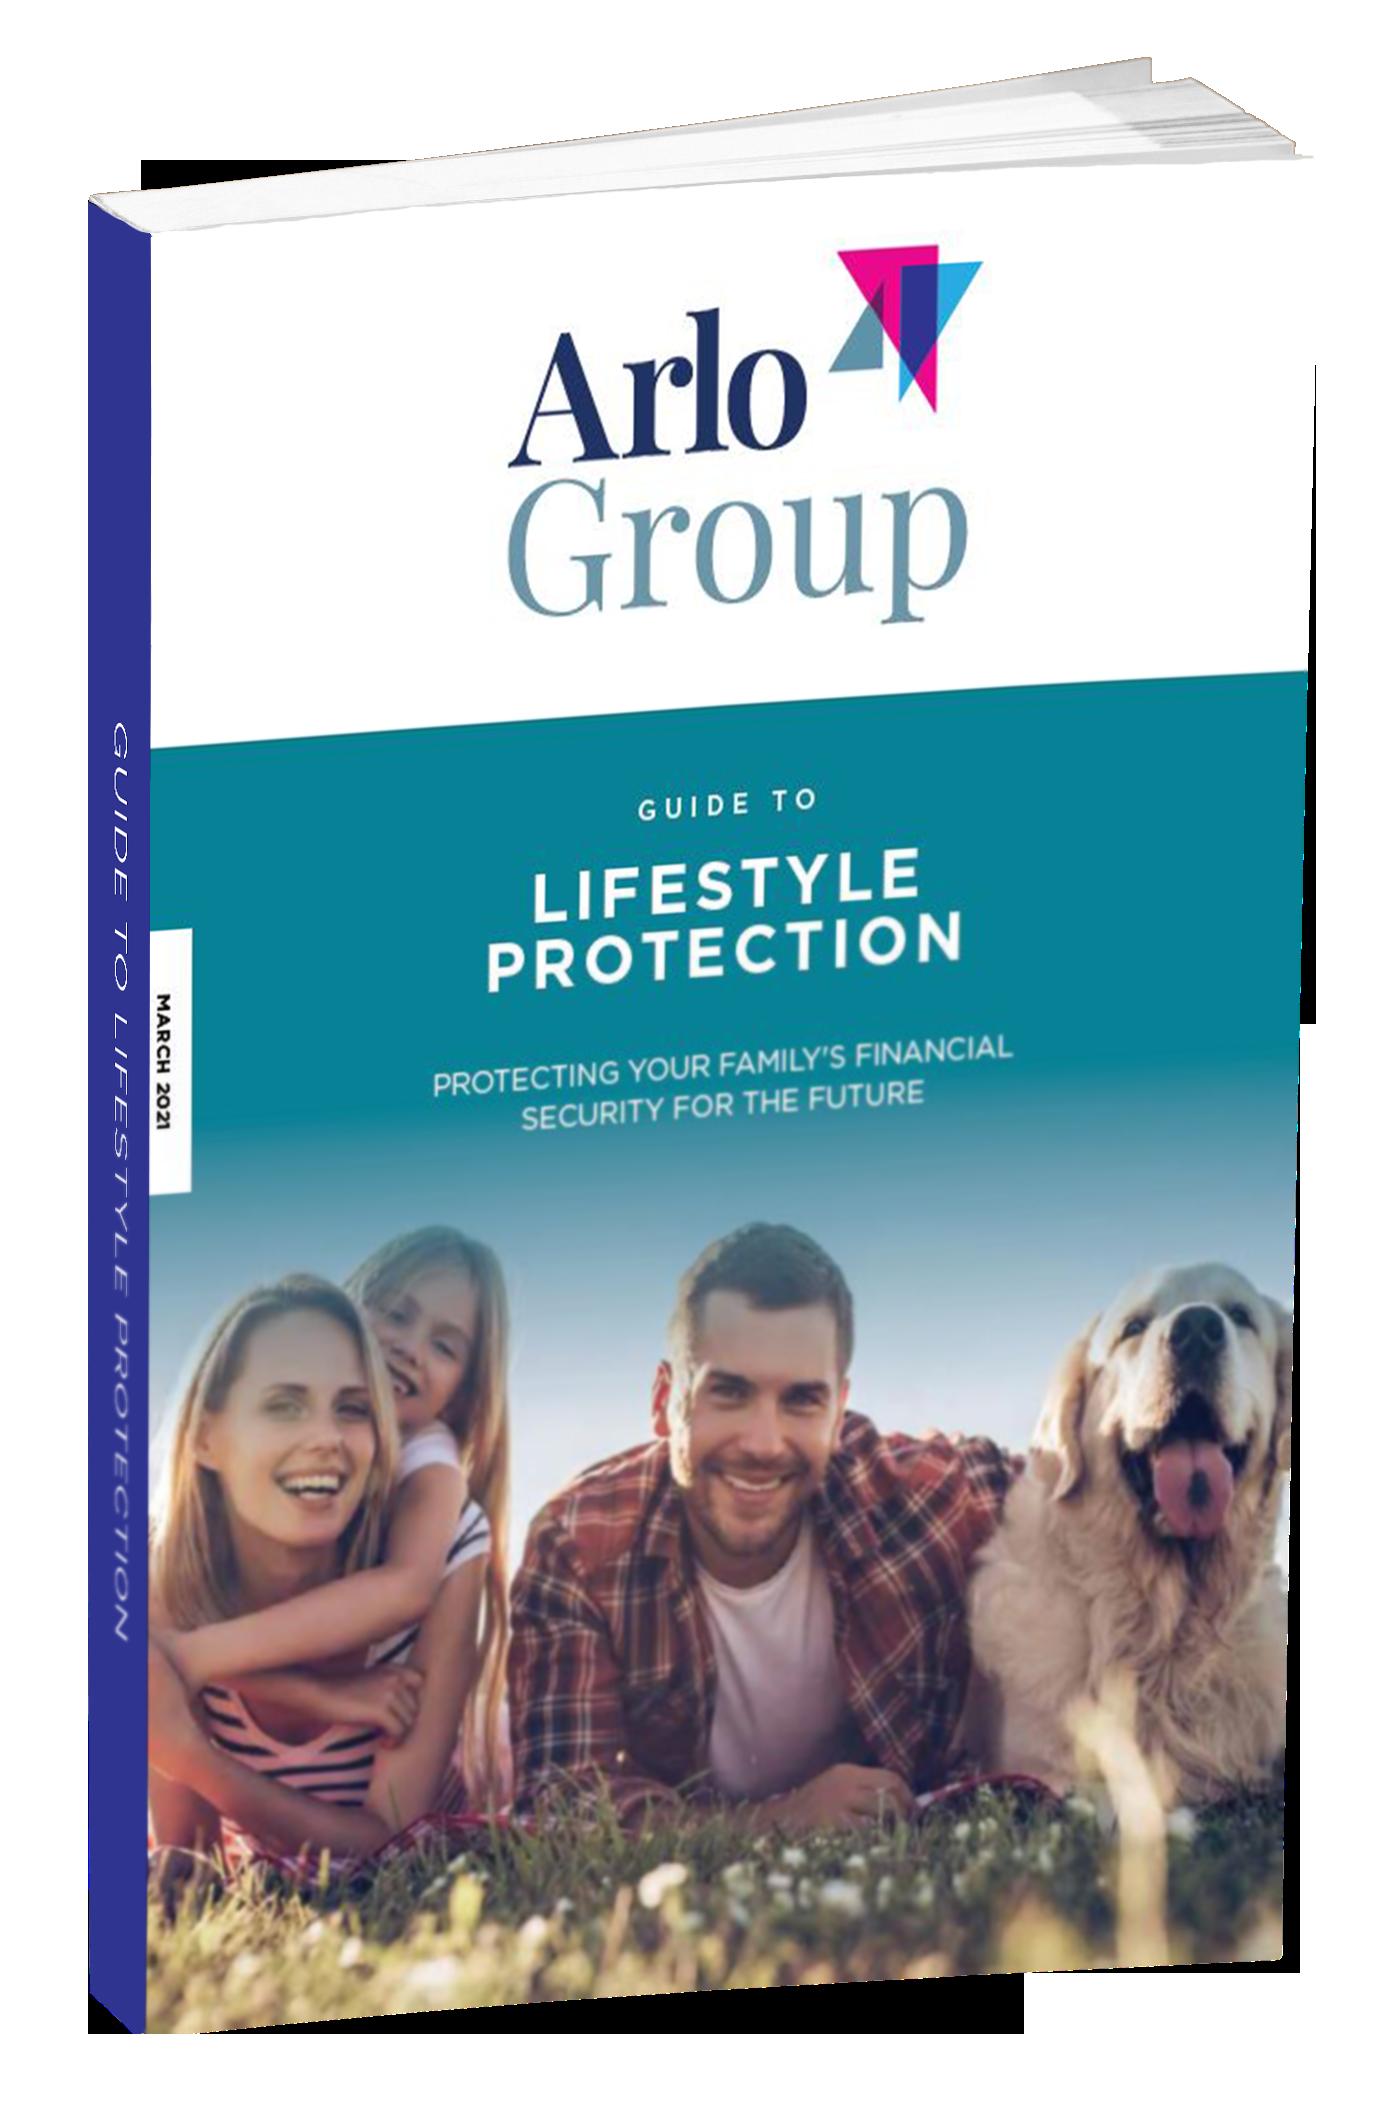 lifestyle-protection-mock-up-arlo-group